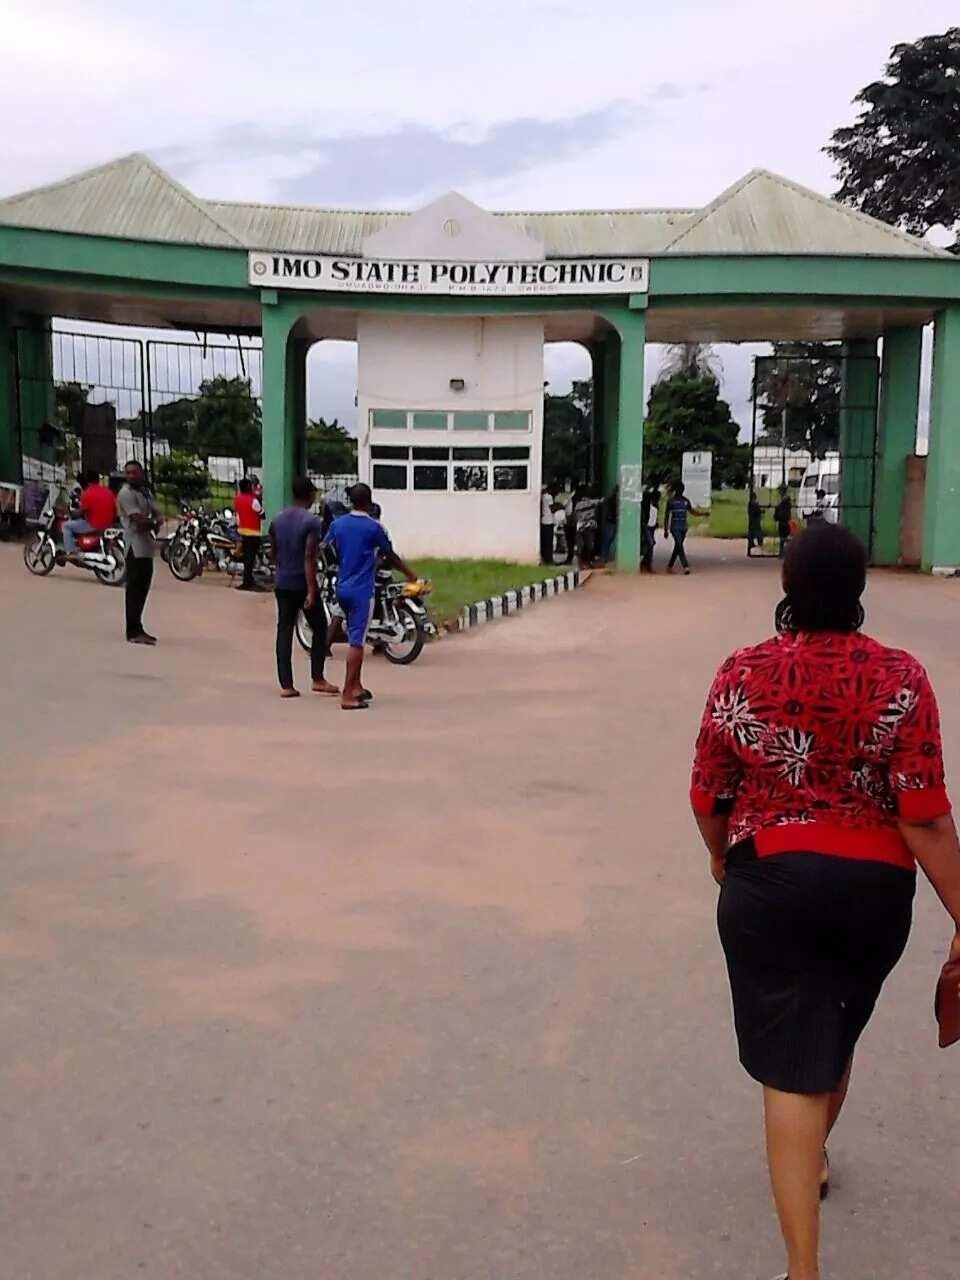 Best Polytechnic in Nigeria 2017 Imo